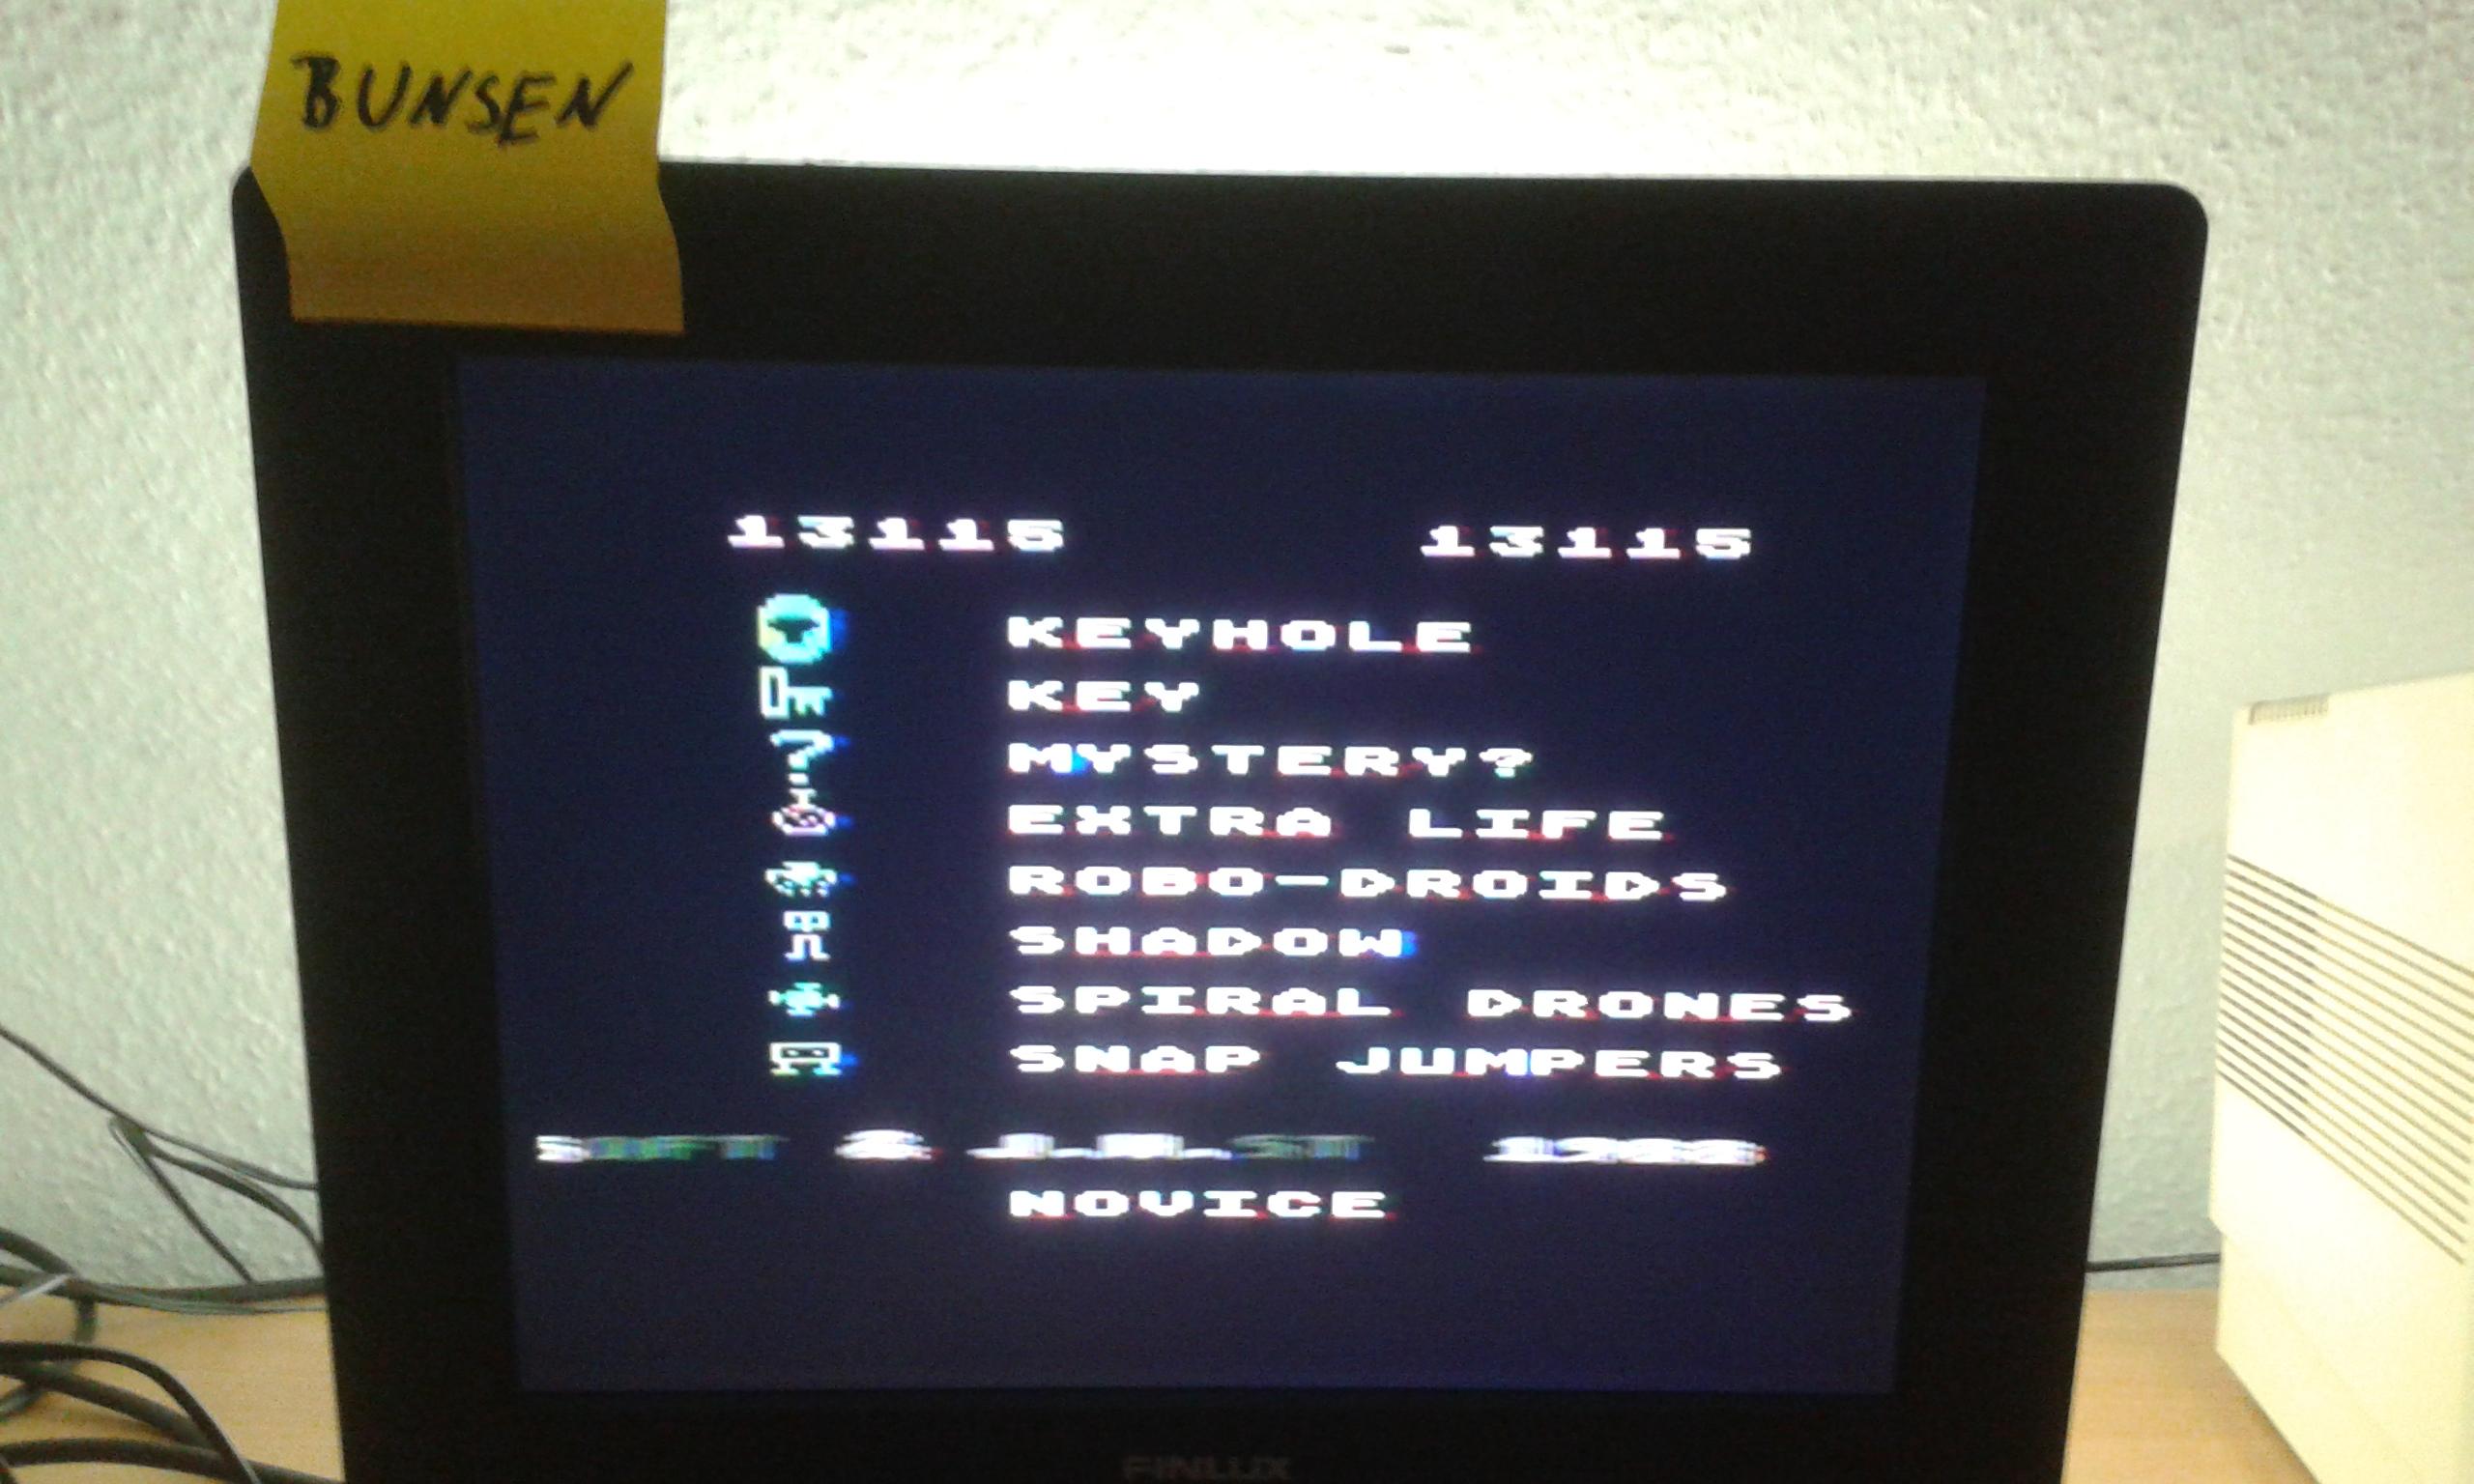 Bunsen: Shamus (Atari 400/800/XL/XE) 13,115 points on 2014-10-24 15:34:10